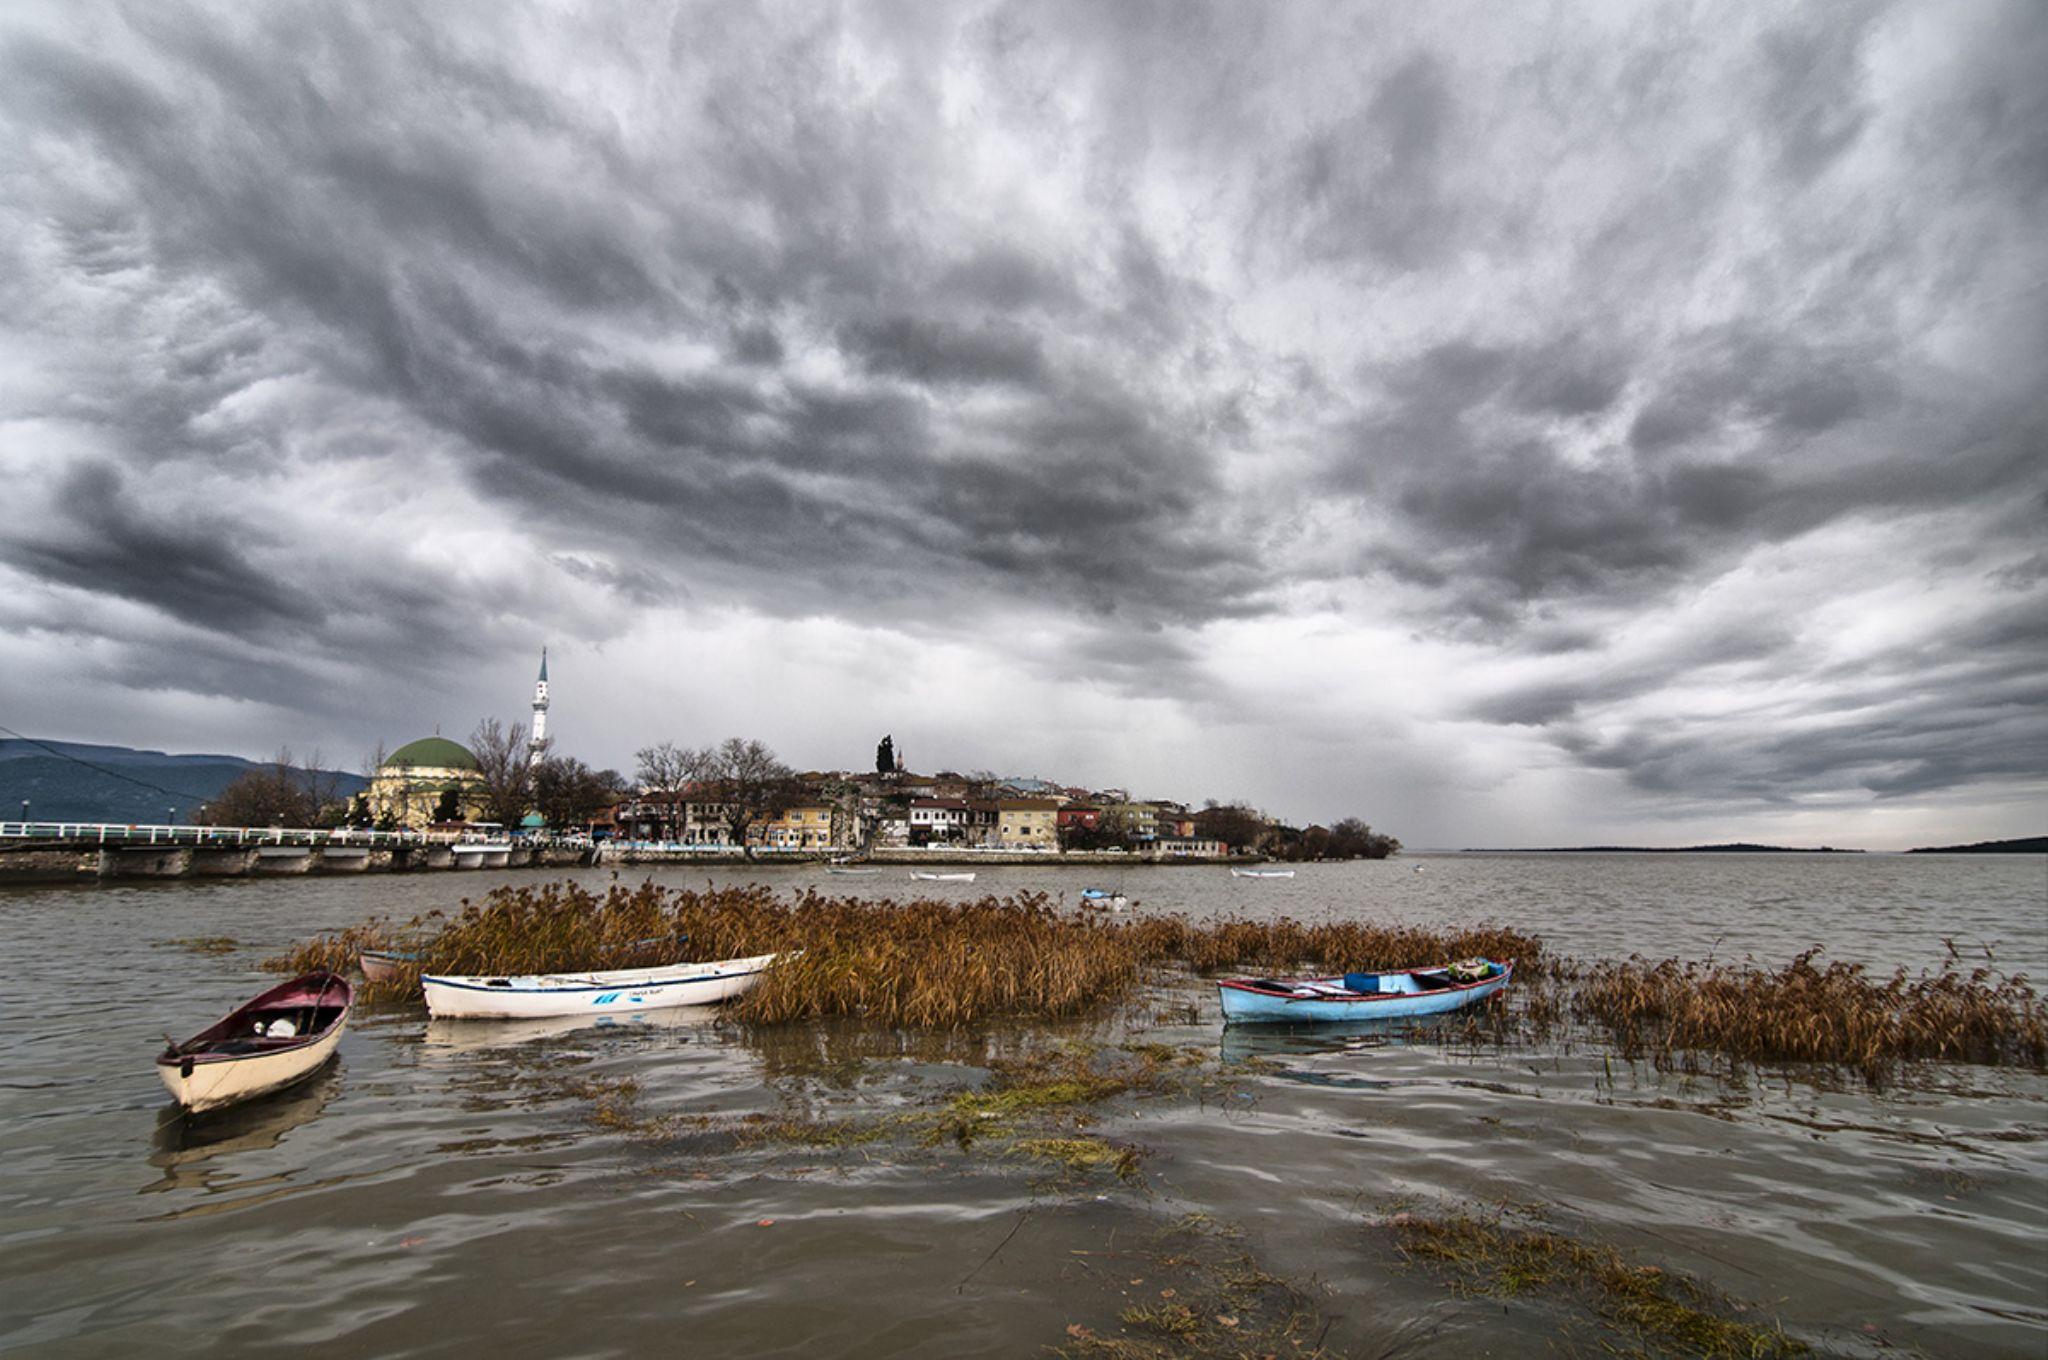 Gölyazı lake by mustafaozdemirphotography